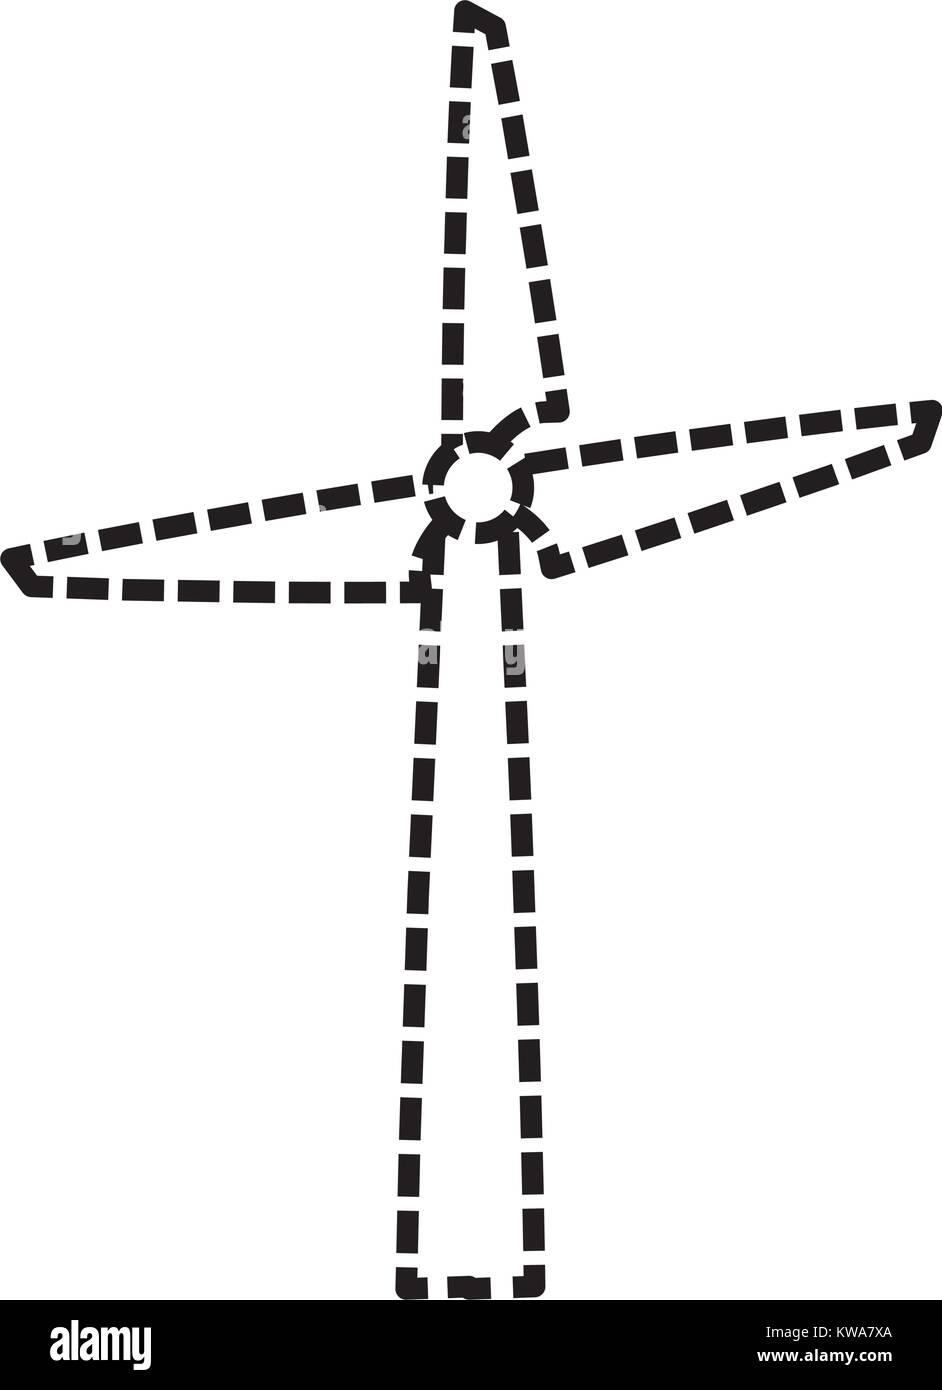 Turbine generator black and white stock photos images alamy wind turbine energy cartoon stock image biocorpaavc